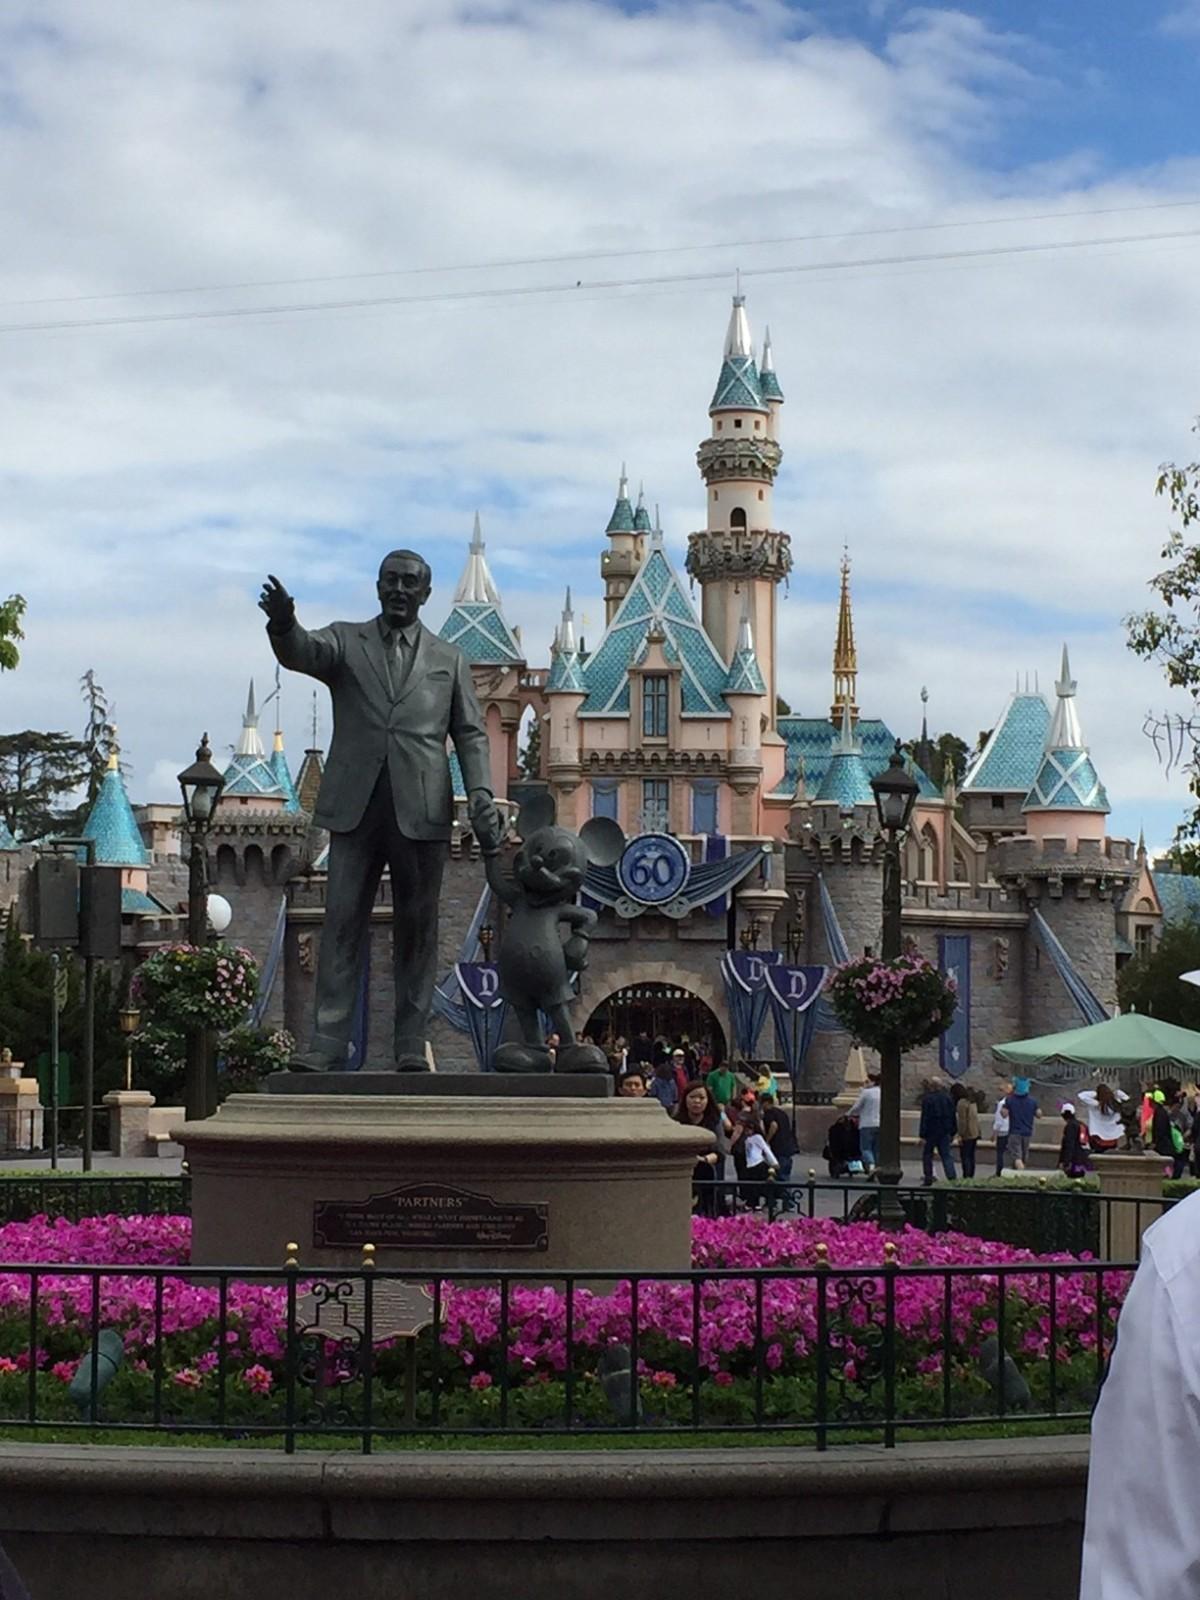 A Disney World nut atDisneyland